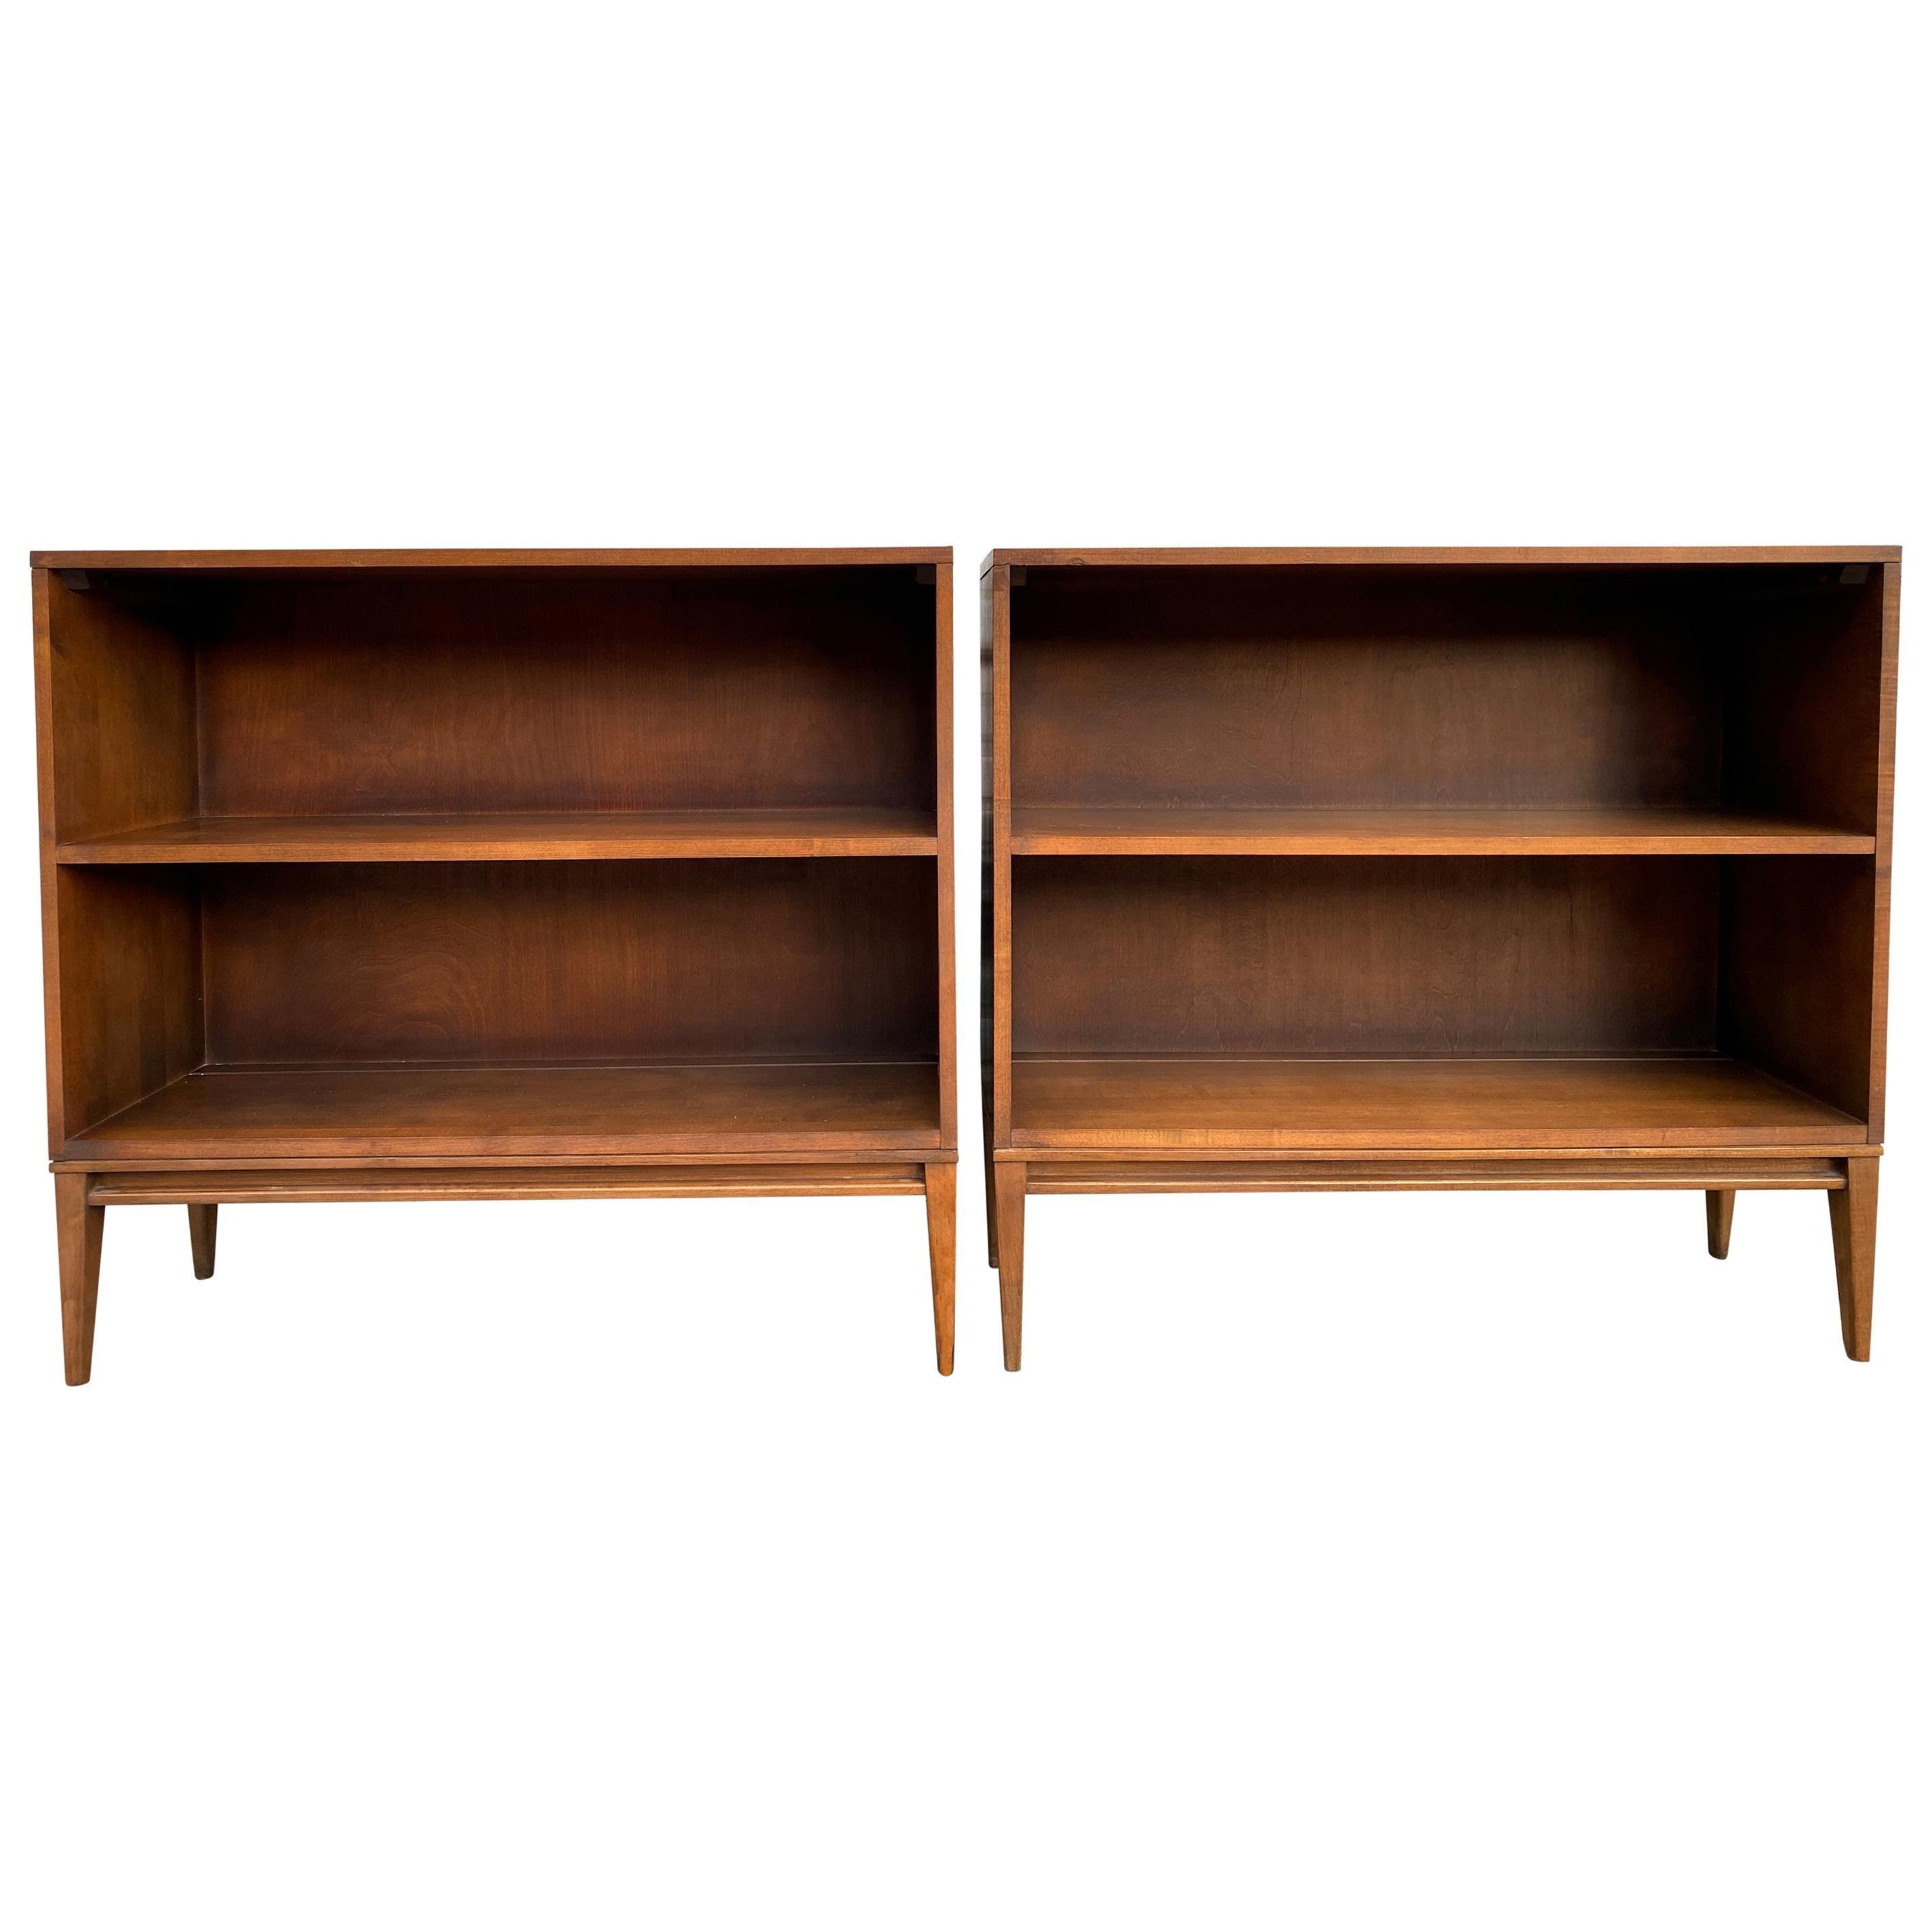 Pair of Midcentury Paul McCobb Single Bookshelves #1516 Maple Walnut Finish